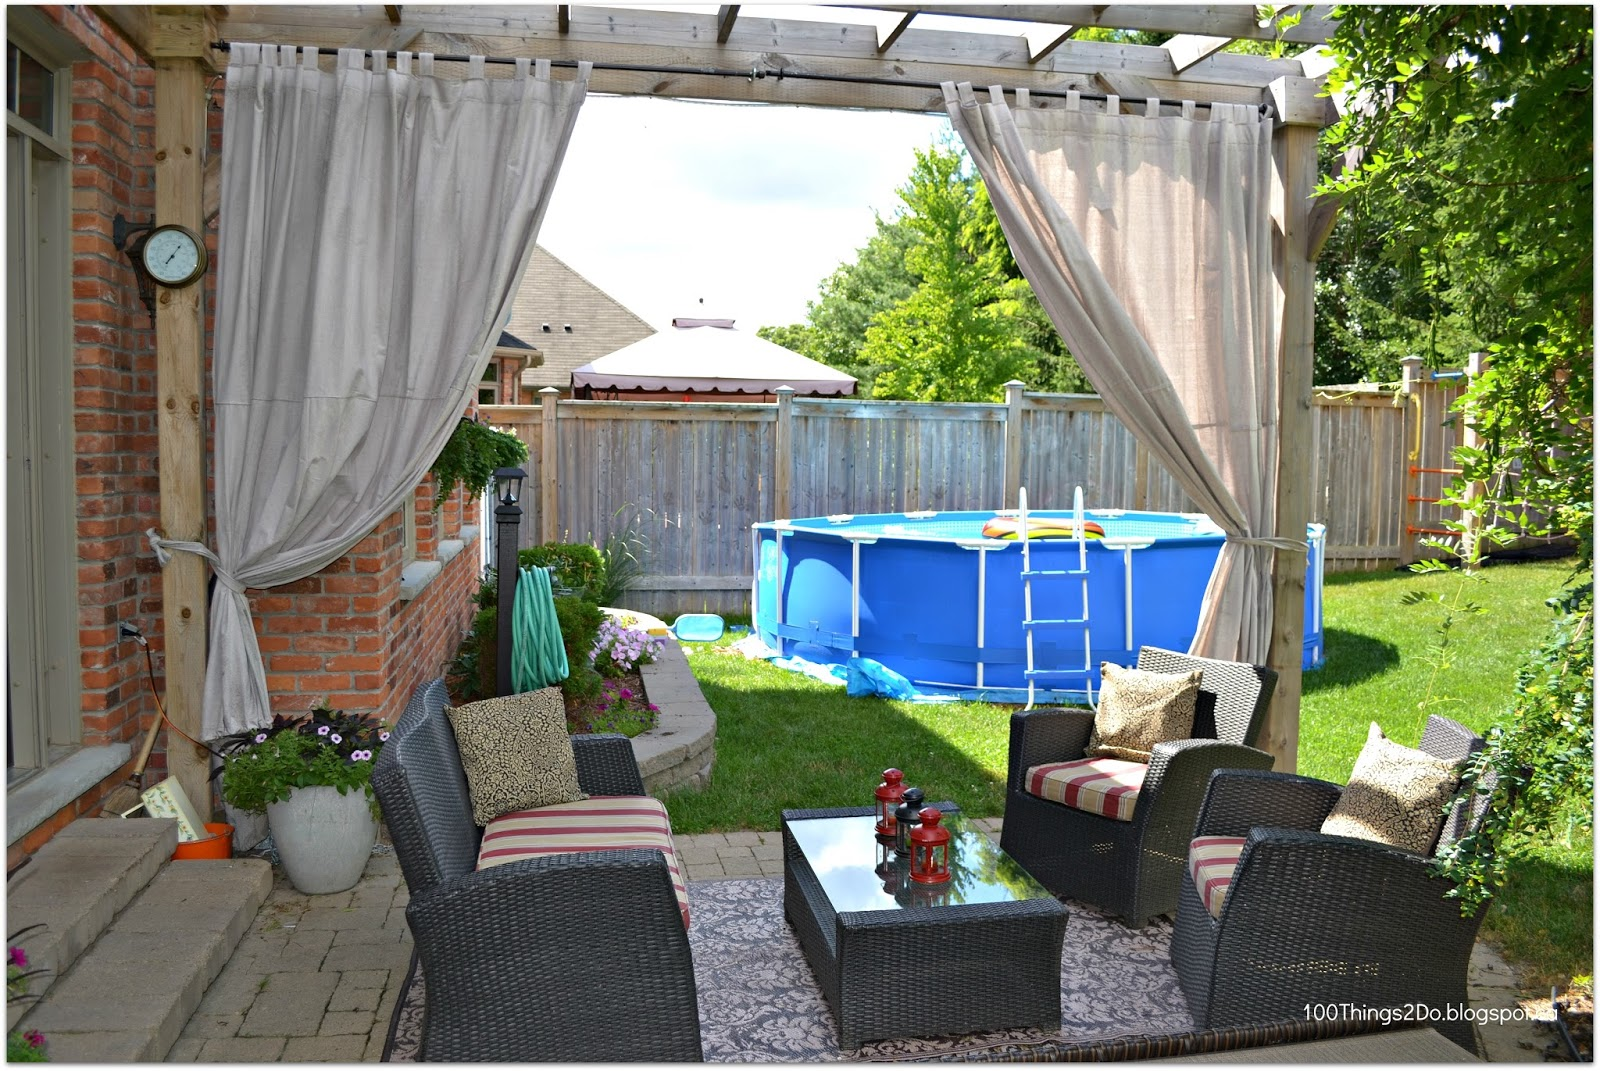 Diy patio curtains 100 things 2 do - Imagenes de porches ...